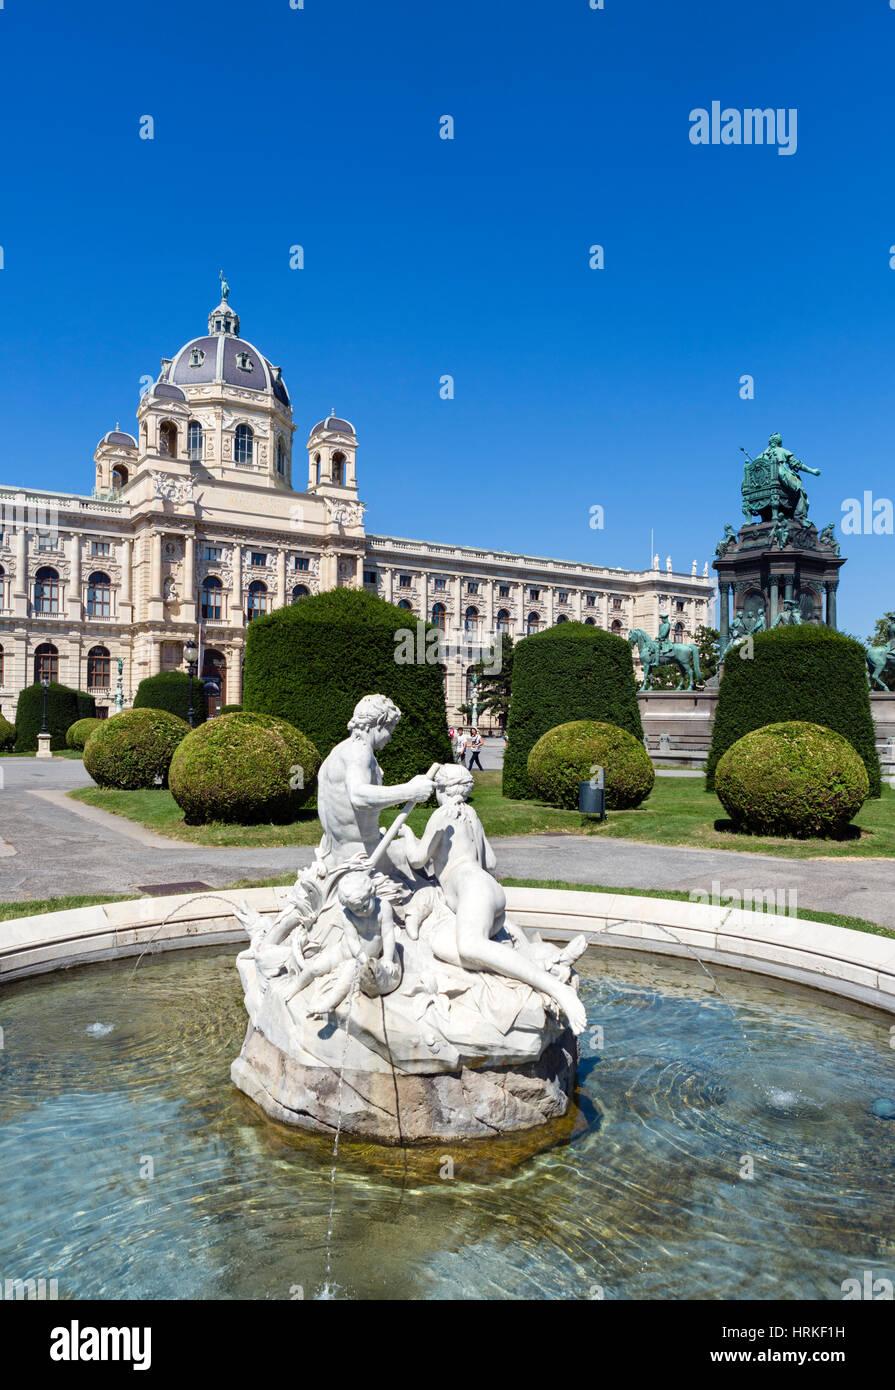 The Natural History Museum ( Naturhistorisches Museum ), Maria-Theresien-Platz, Vienna, Austria - Stock Image